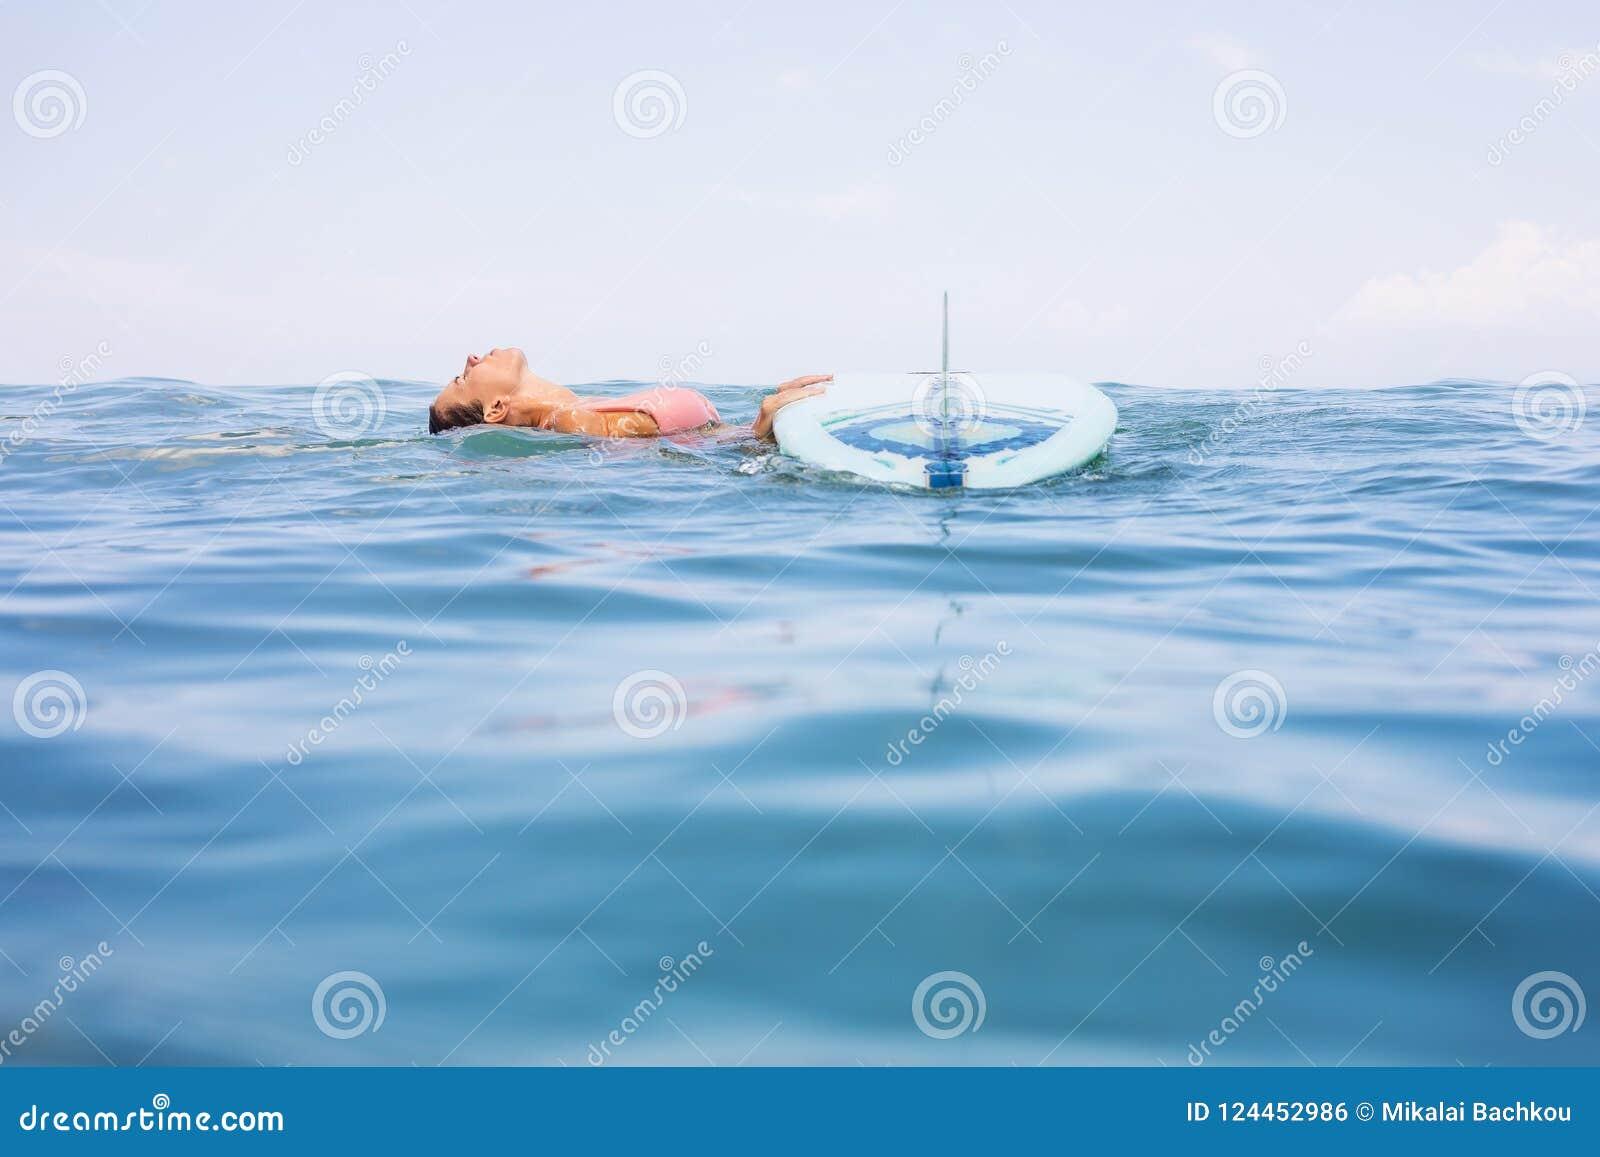 Hawaii surf girl hot apologise